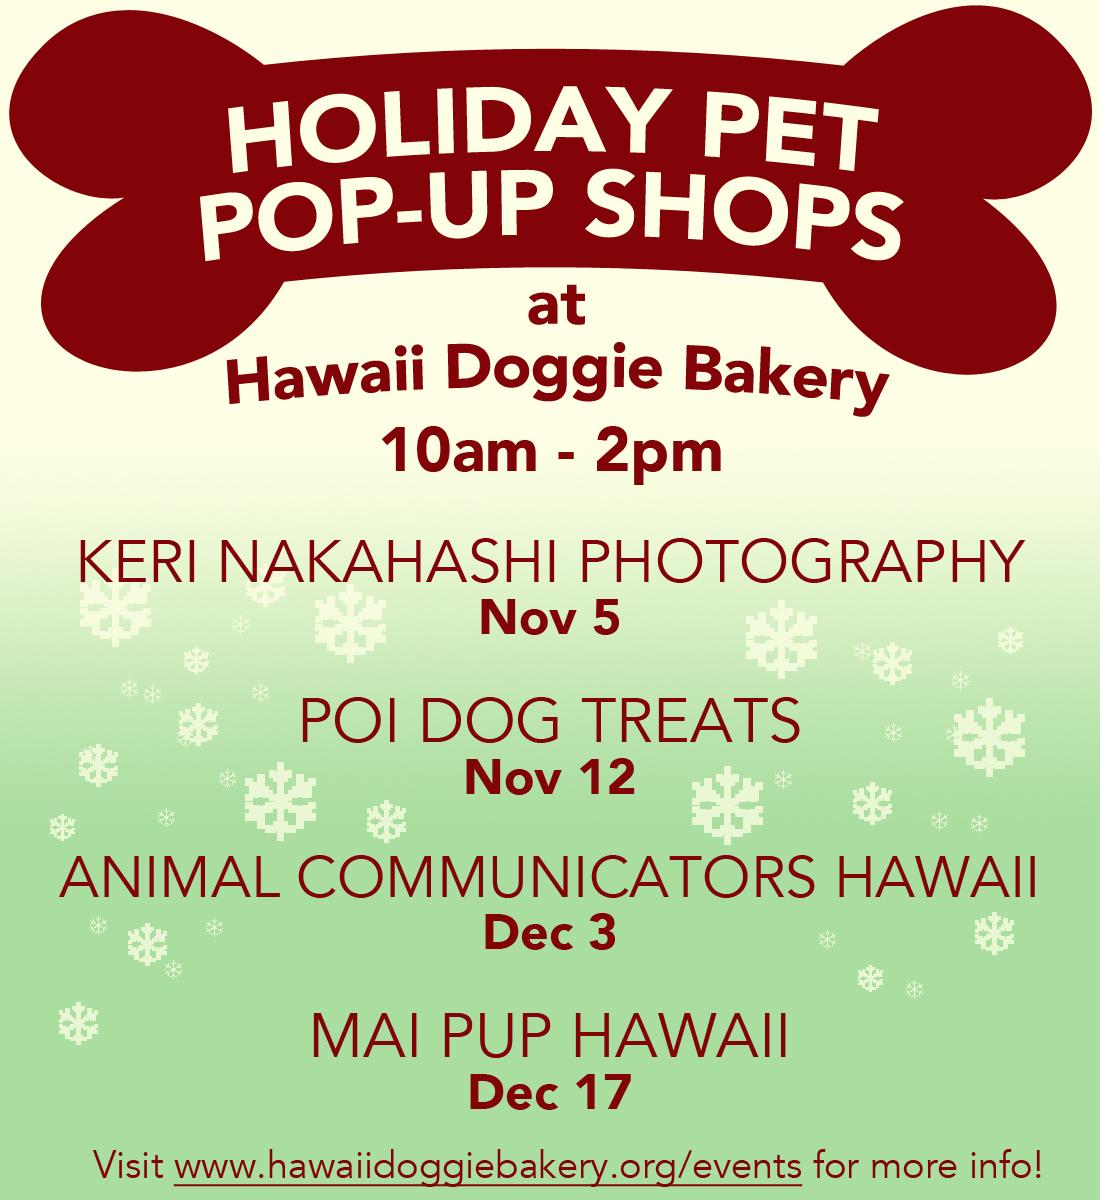 holiday-pet-pop-up-shops-2016